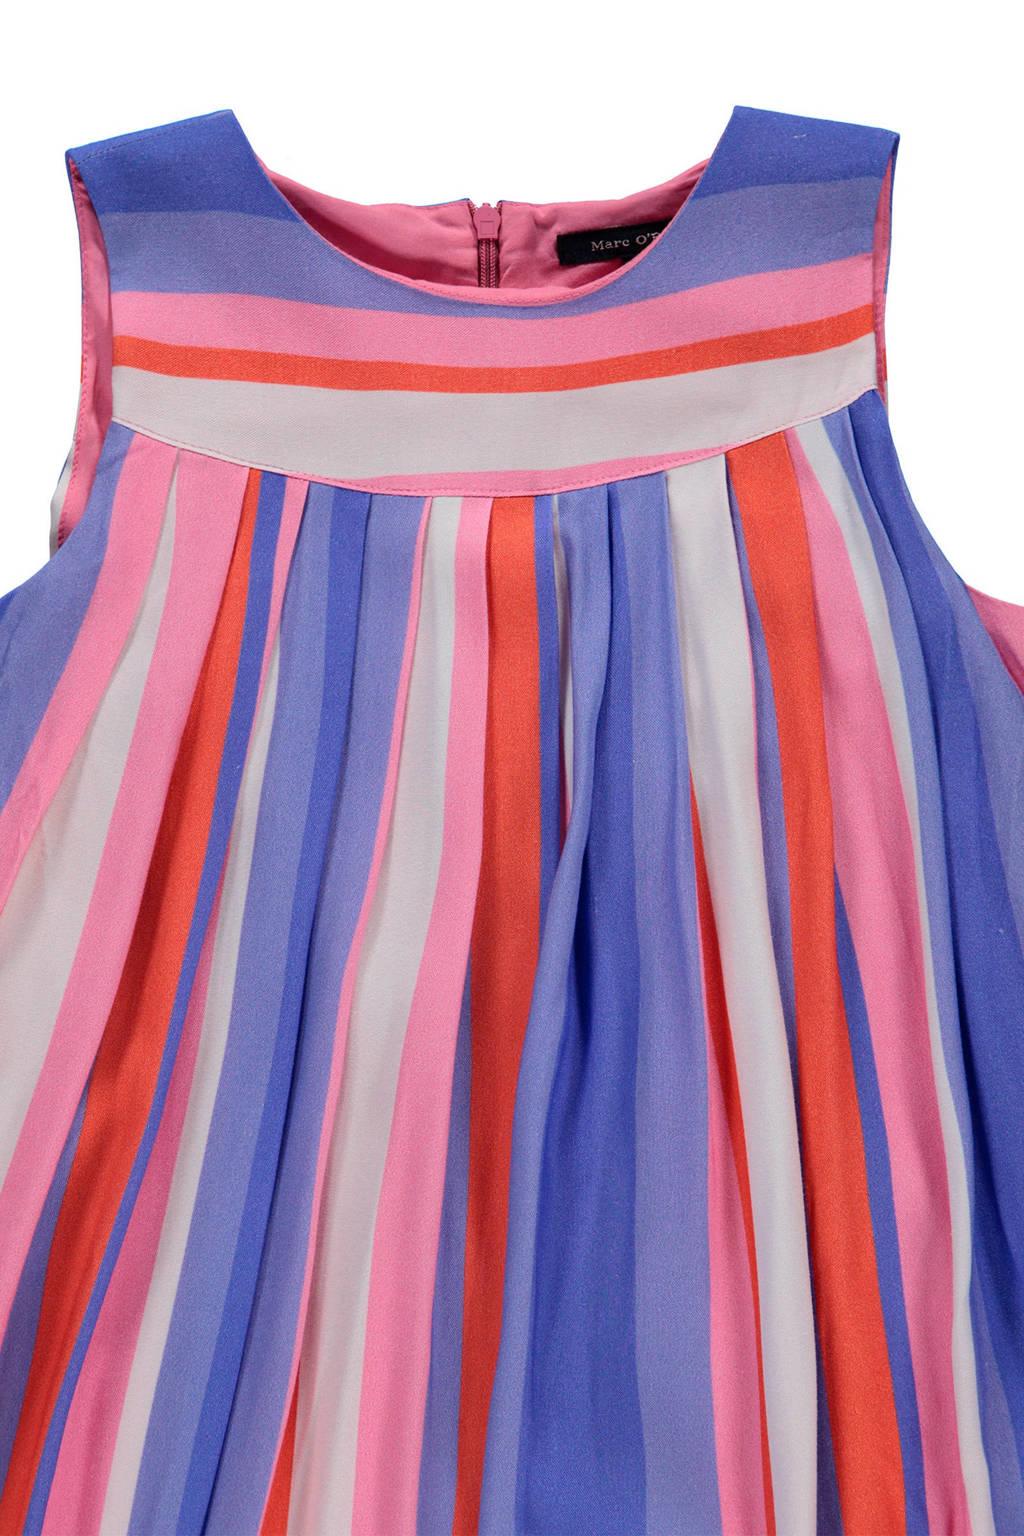 96e4184b981d3a Marc O Polo gestreepte jurk blauw roze